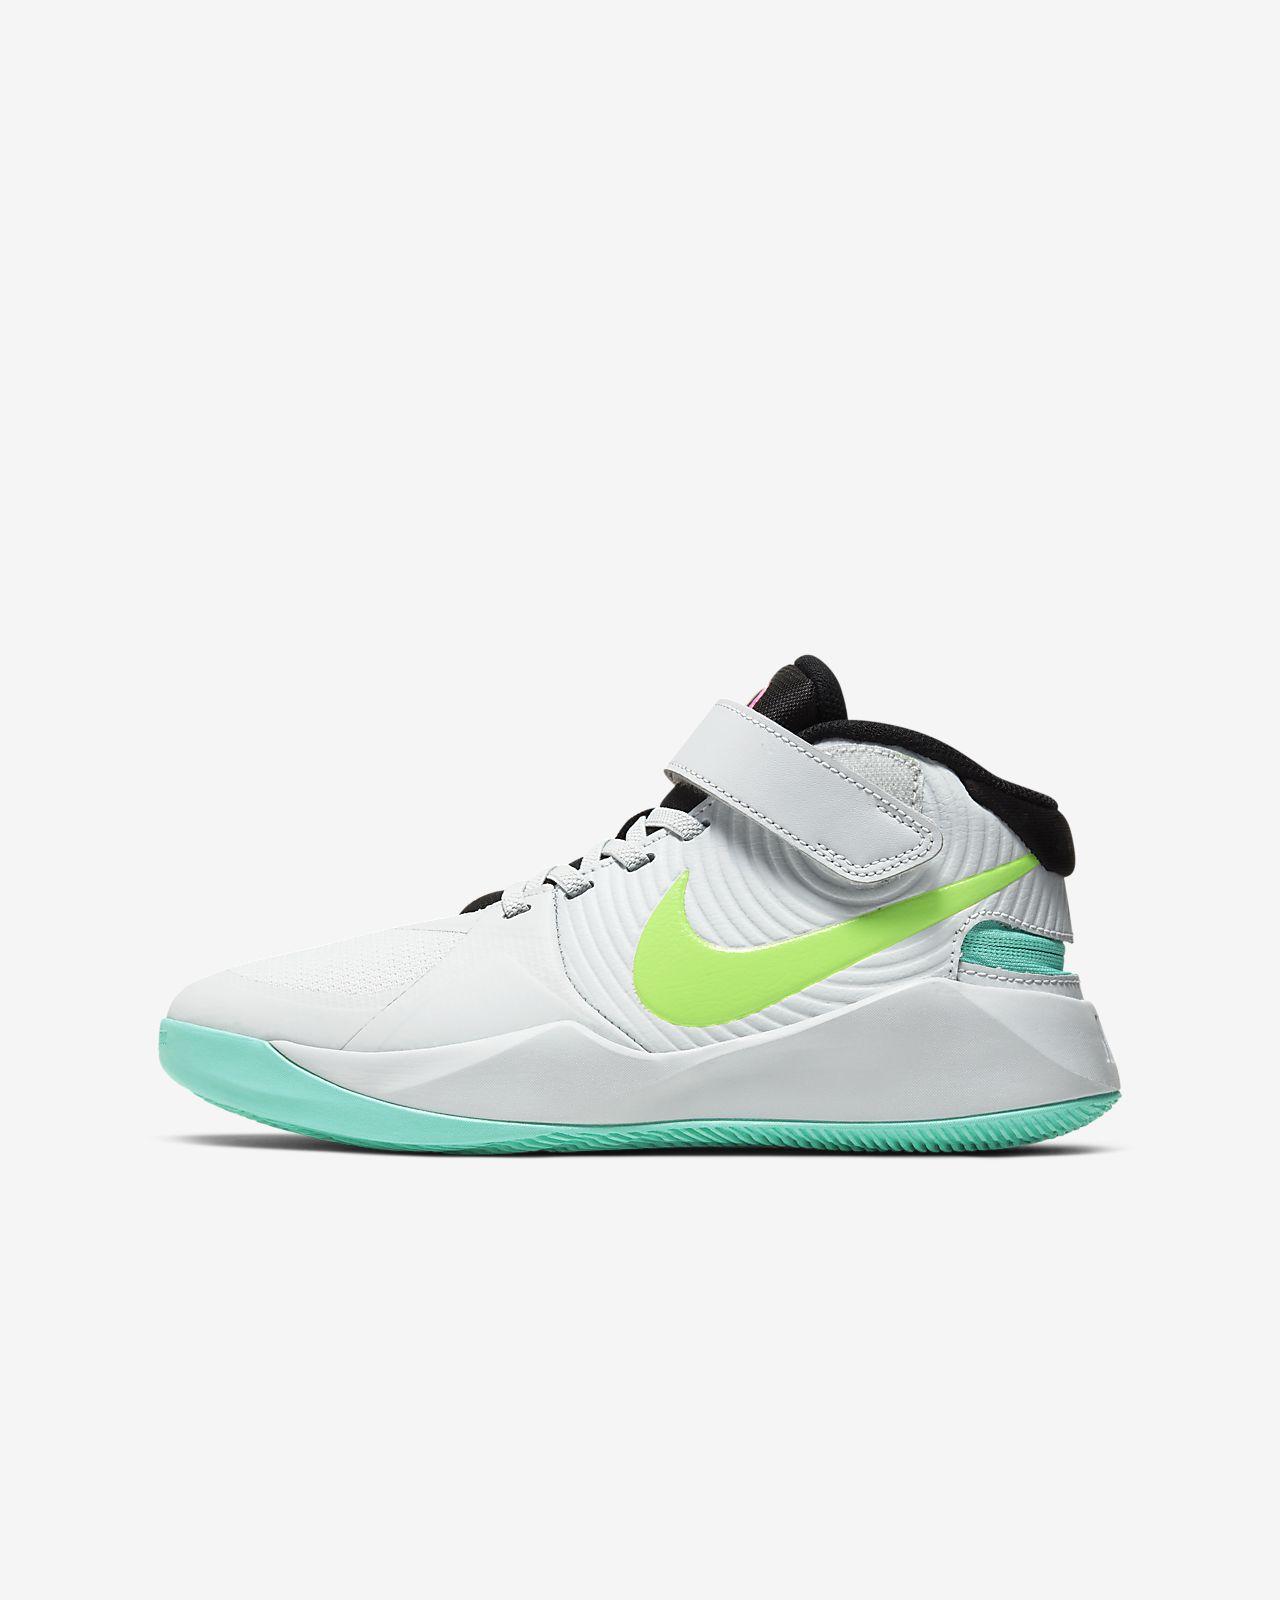 Nike Team Hustle D 9 FlyEase Big Kids' Basketball Shoe